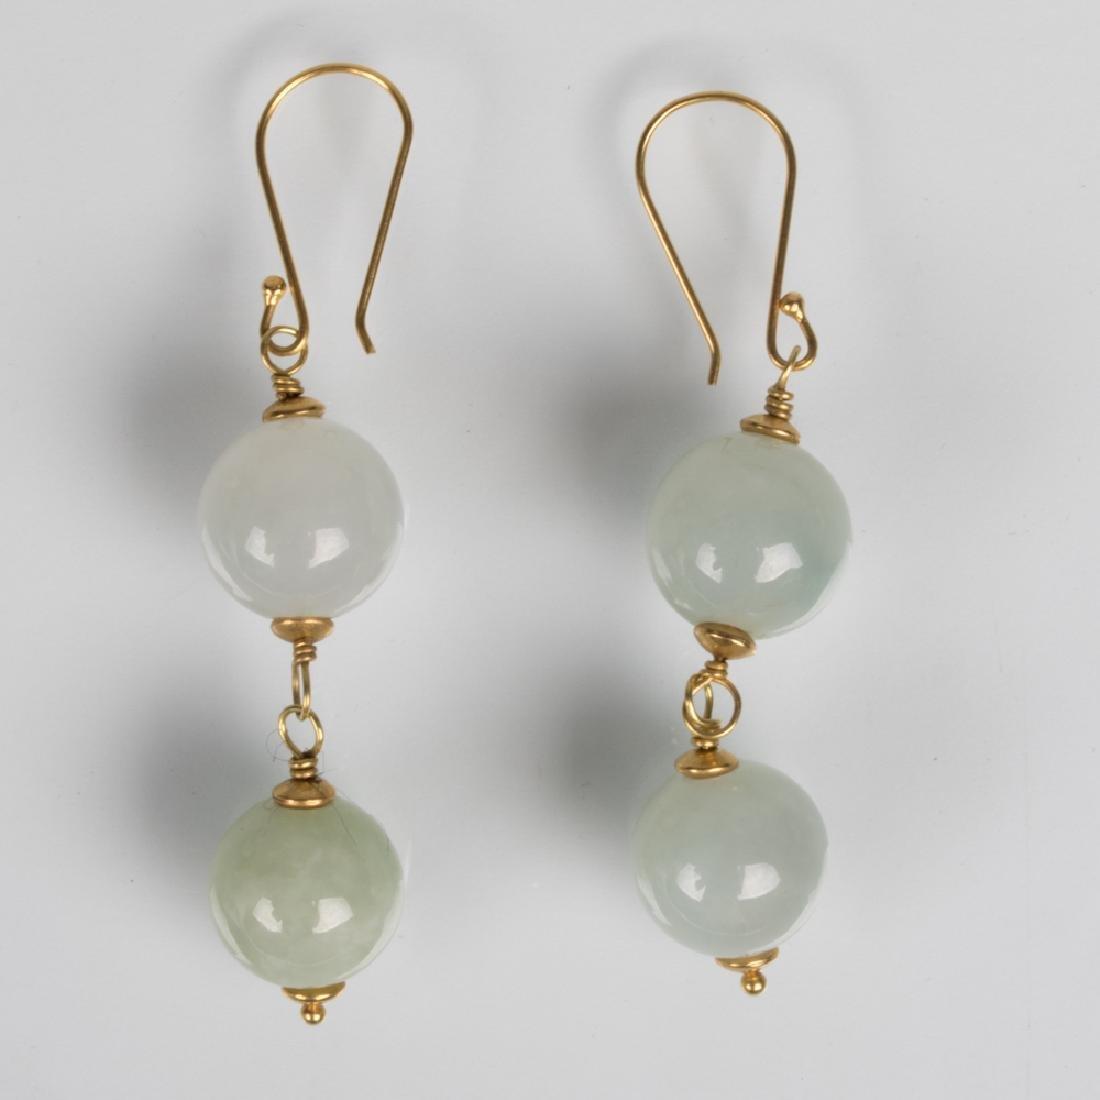 A Pair of 14kt. Yellow Gold and Celadon Jade Drop